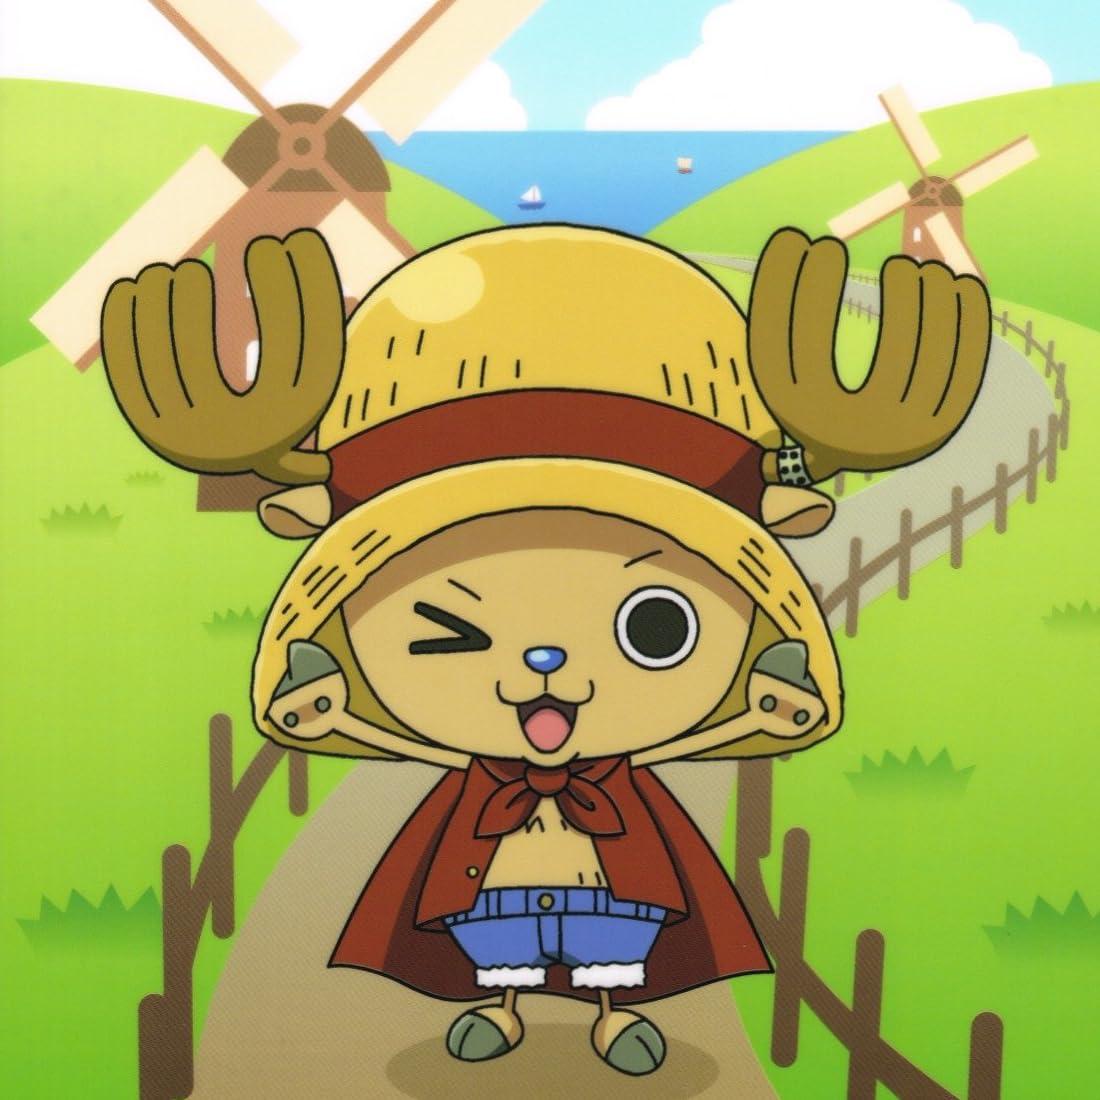 One Piece Ipad壁紙アニメ画像20926 スマポ